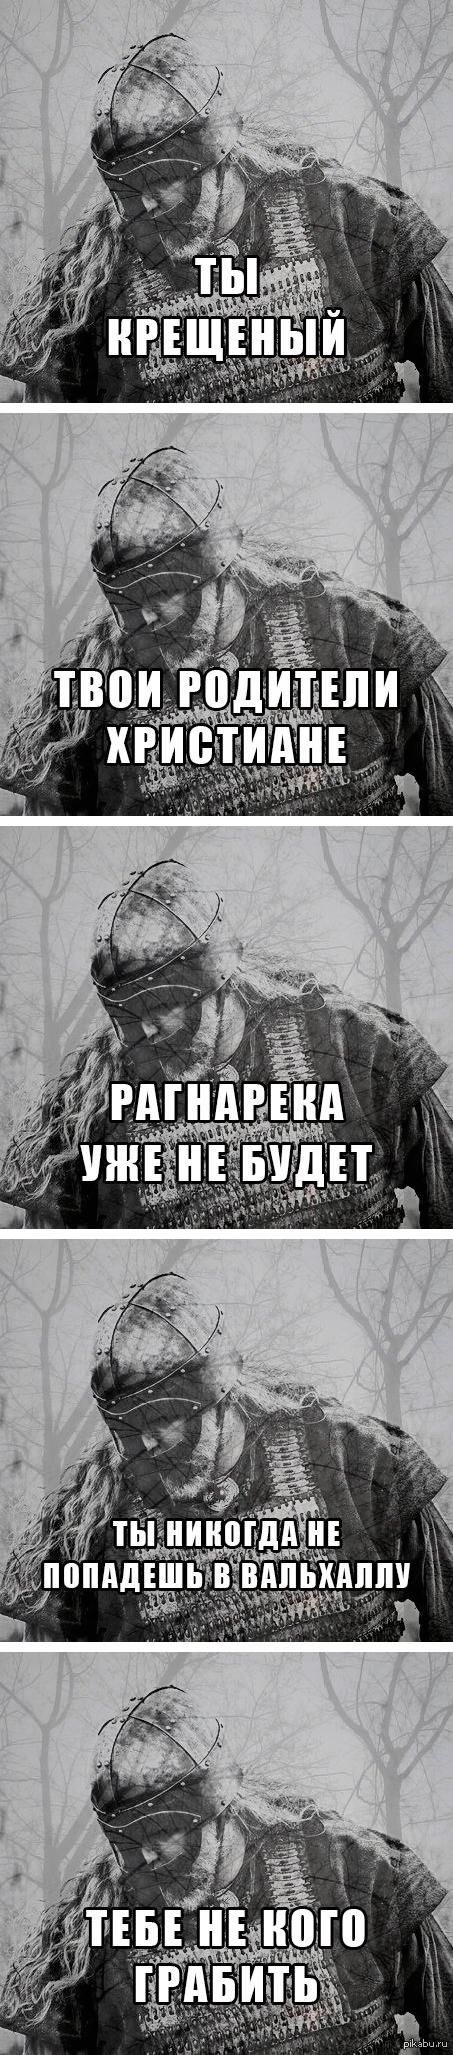 http://s5.pikabu.ru/post_img/2014/05/11/8/1399808114_869610445.jpg